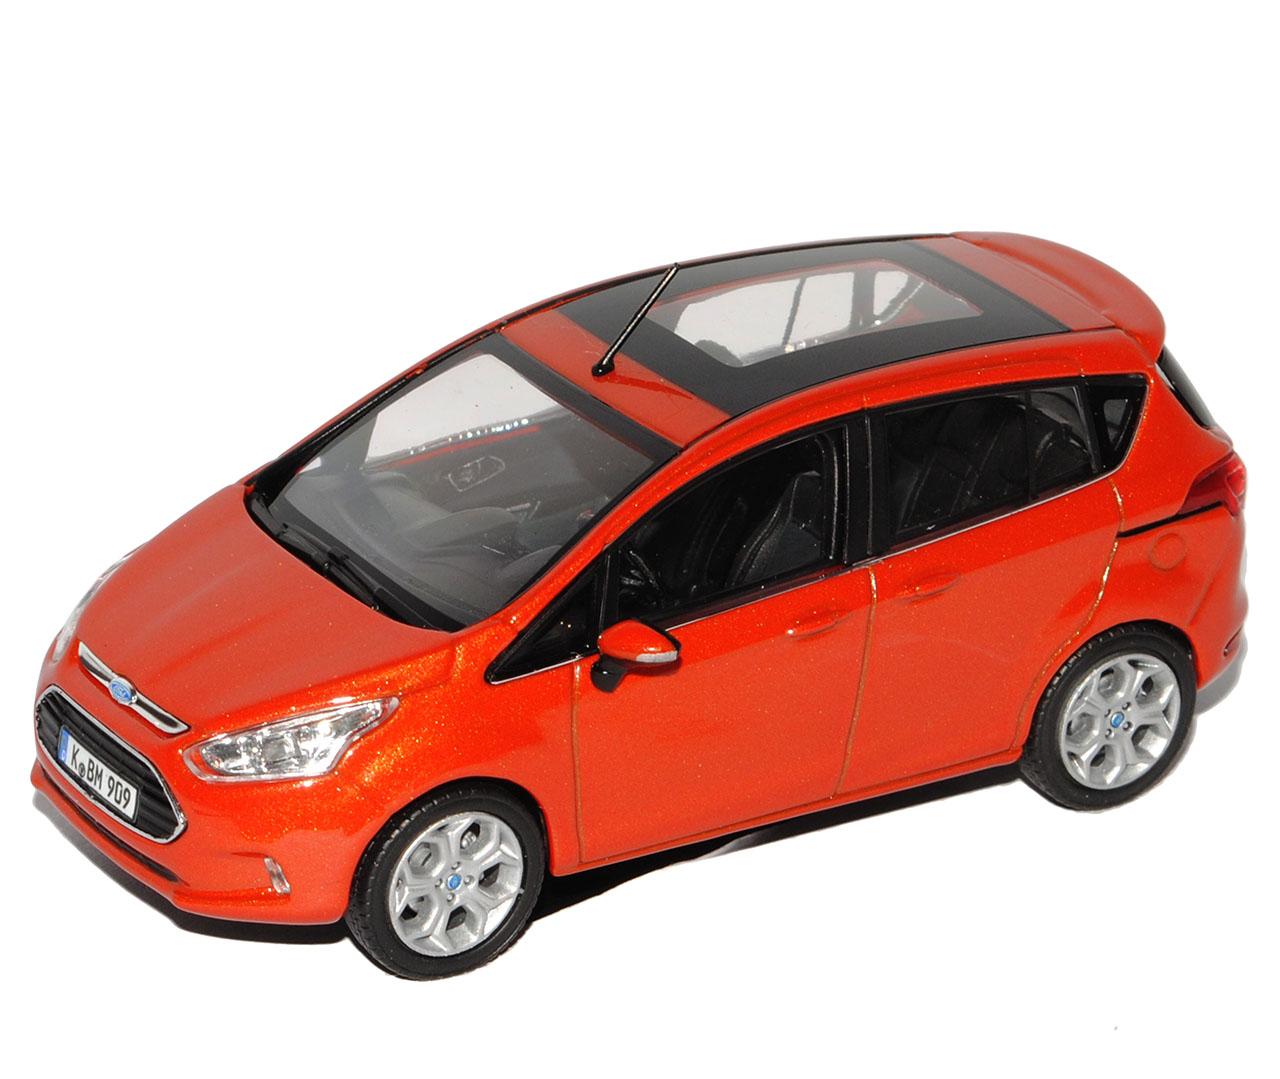 Ford-B-Max-Ab-2012-Rot-Metallic-1-43-Norev-Modell-Auto-mit-oder-ohne-individiu miniatuur 8